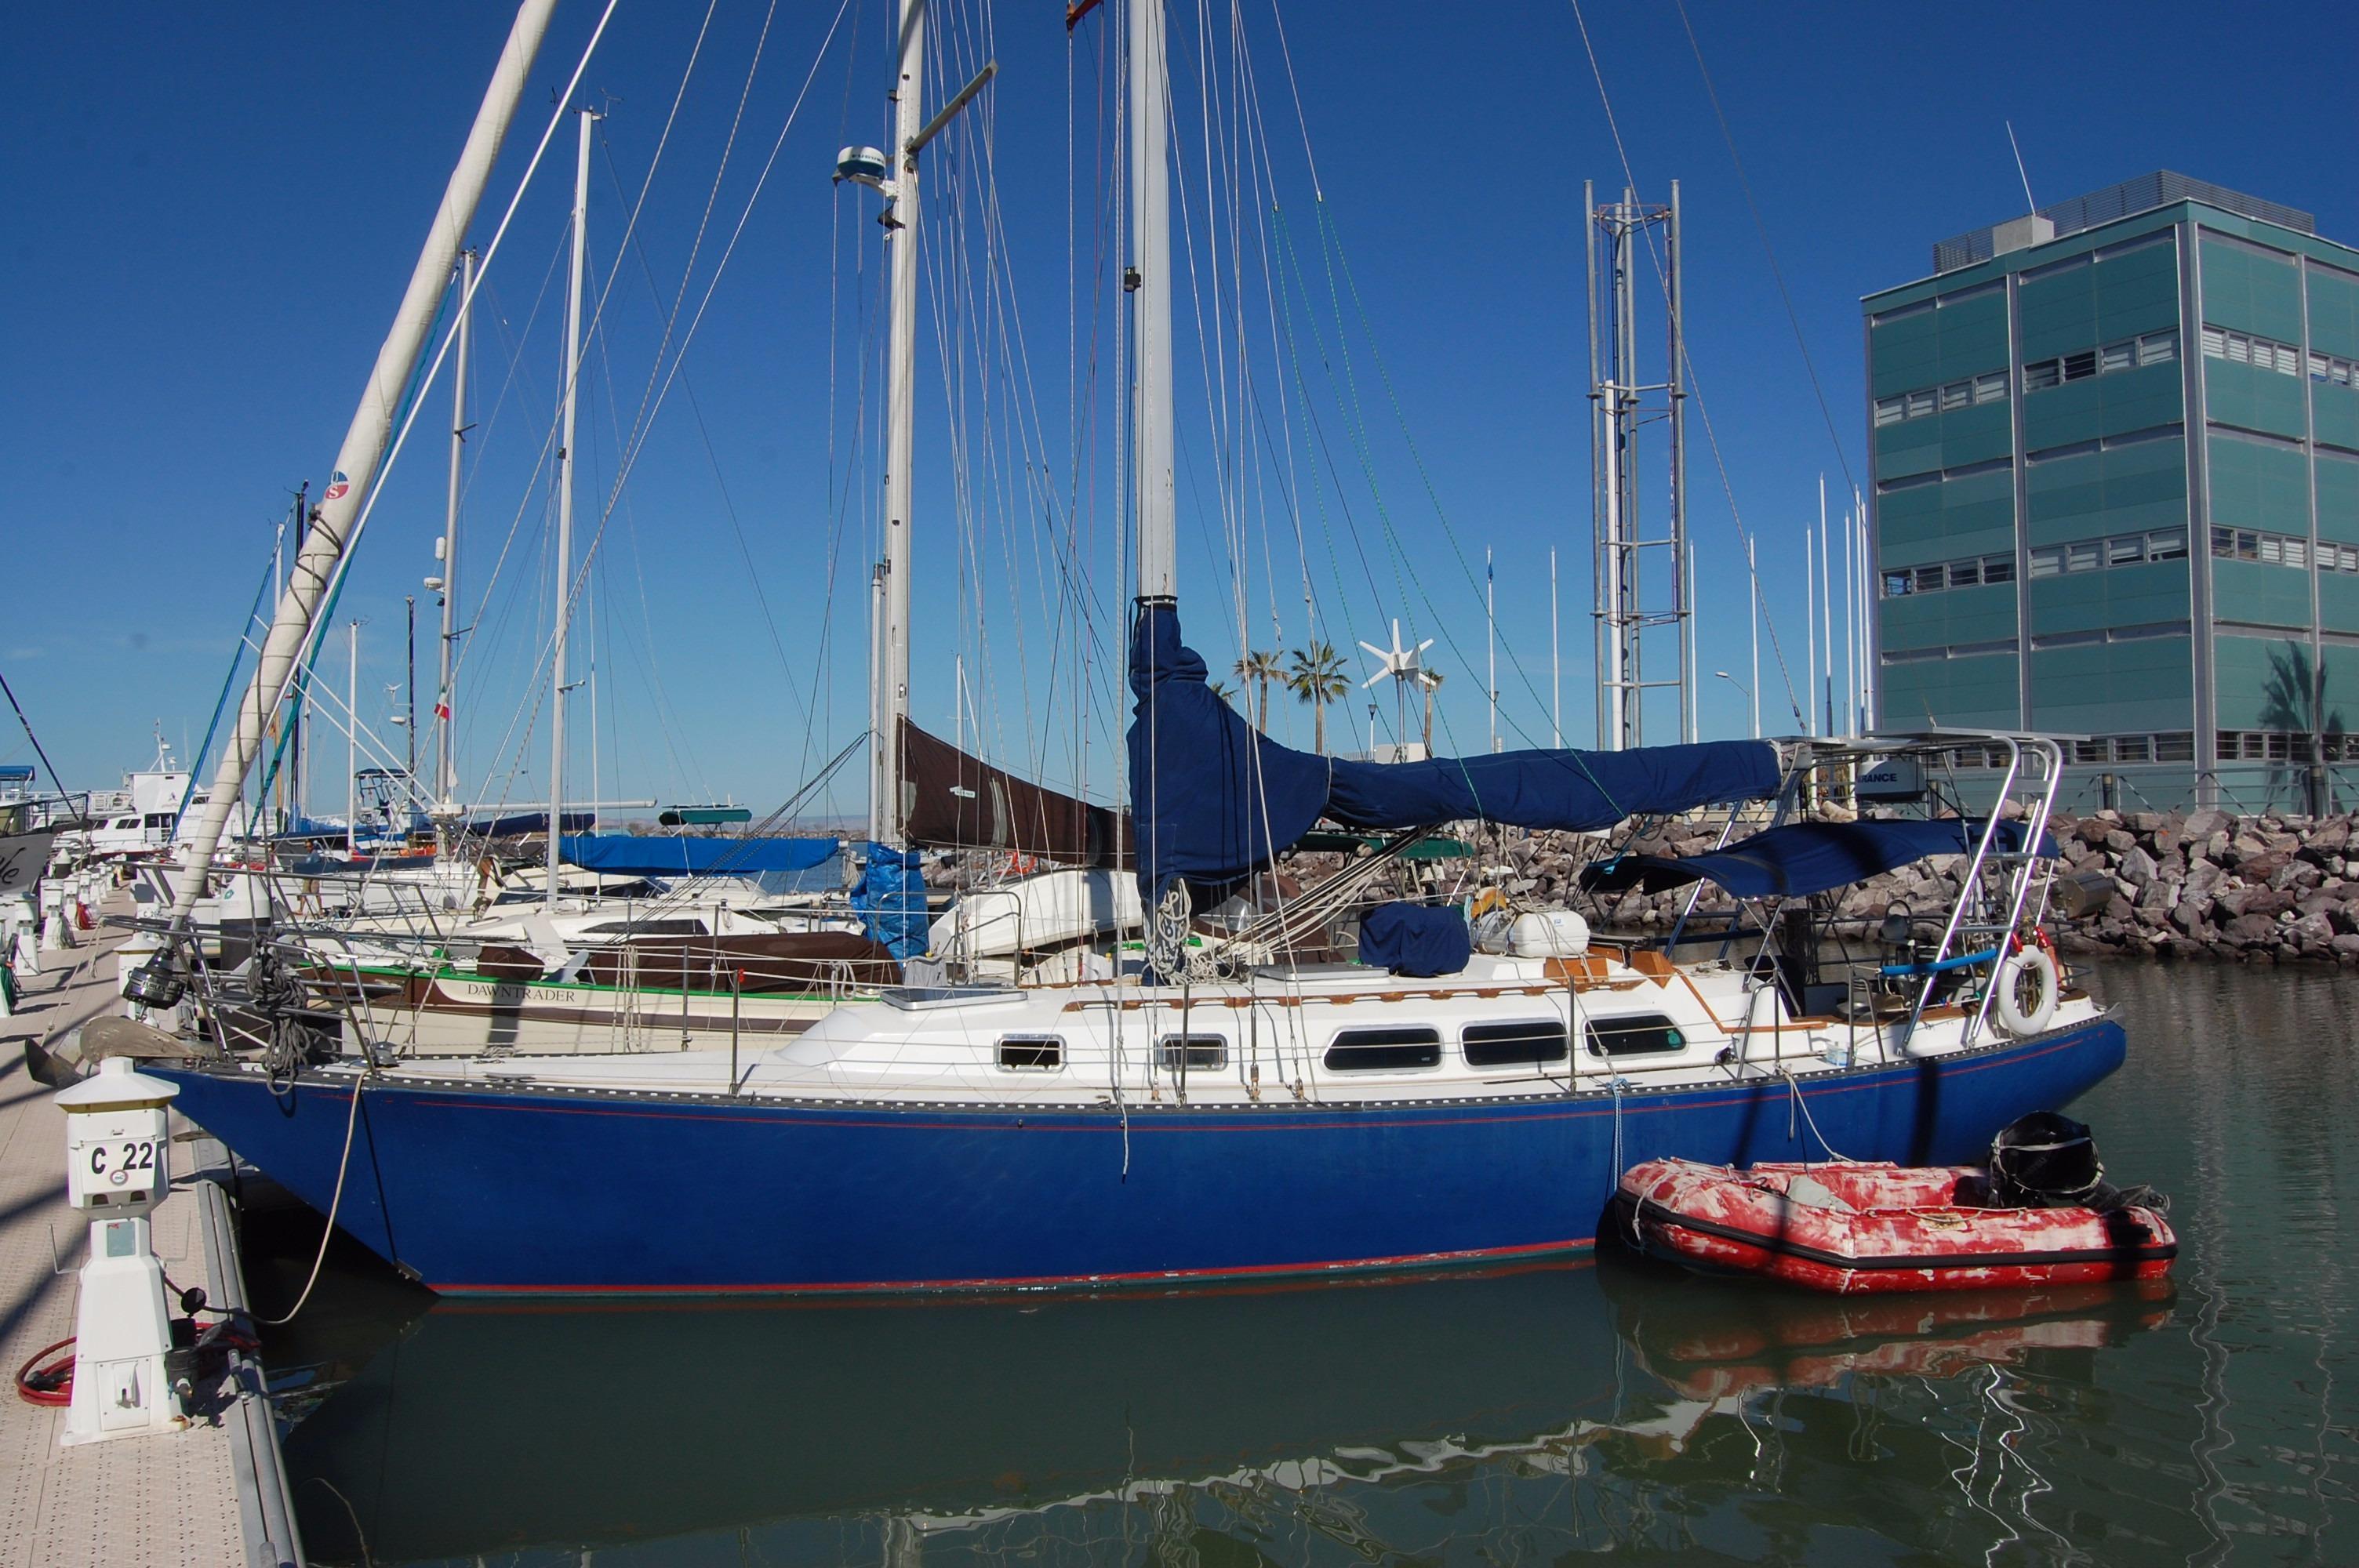 41' Newport Sloop+Boat for sale!